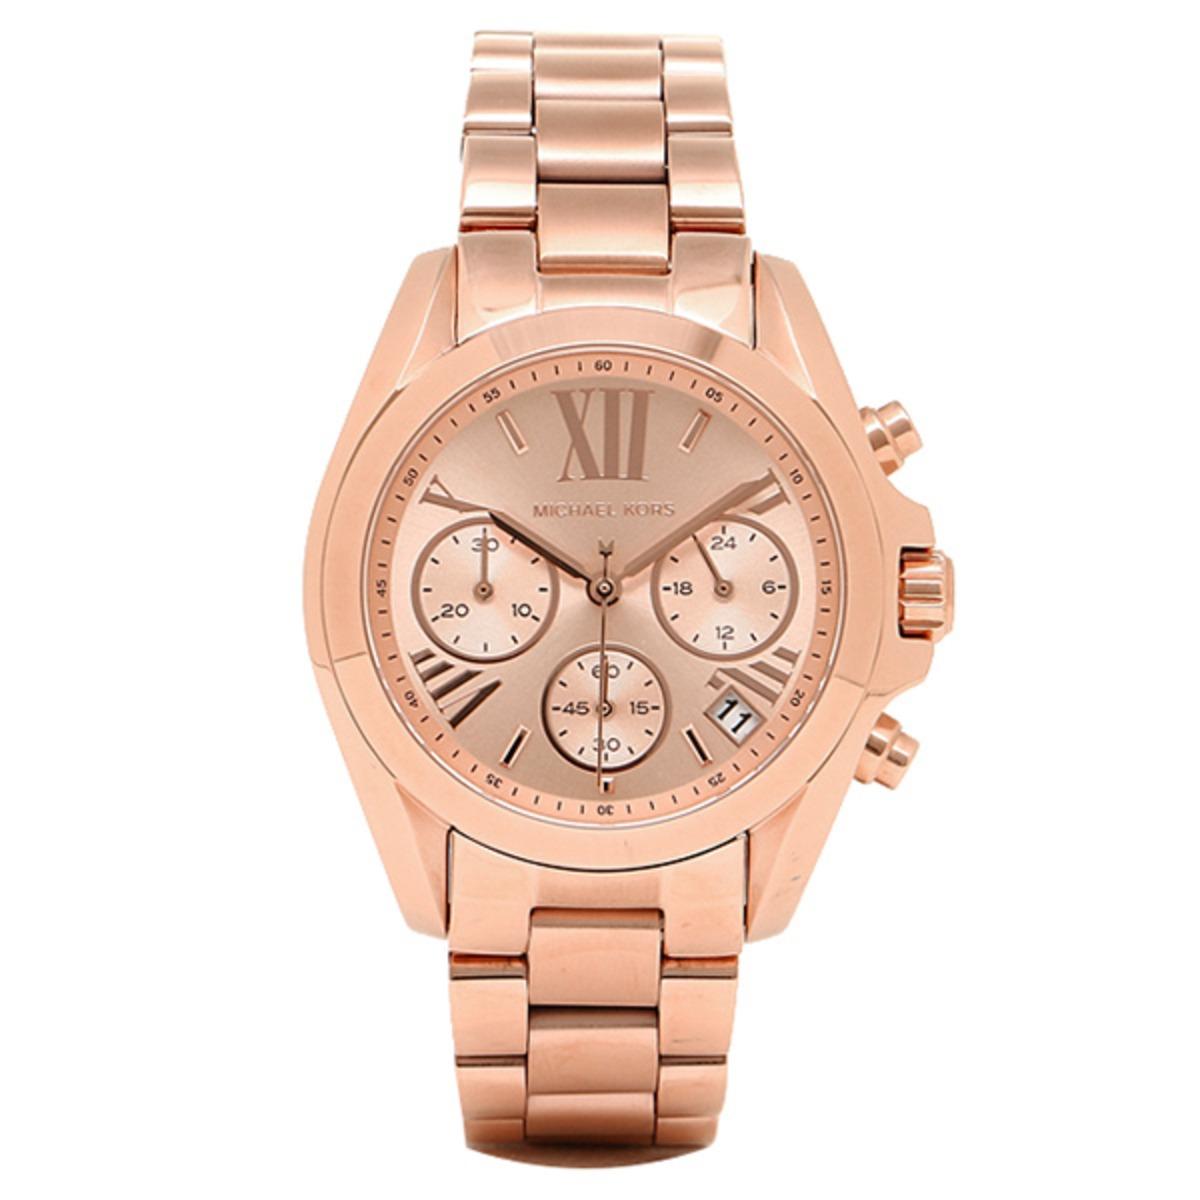 8802c636150a reloj mujer michael kors bradshaw dorado rosa. Cargando zoom.